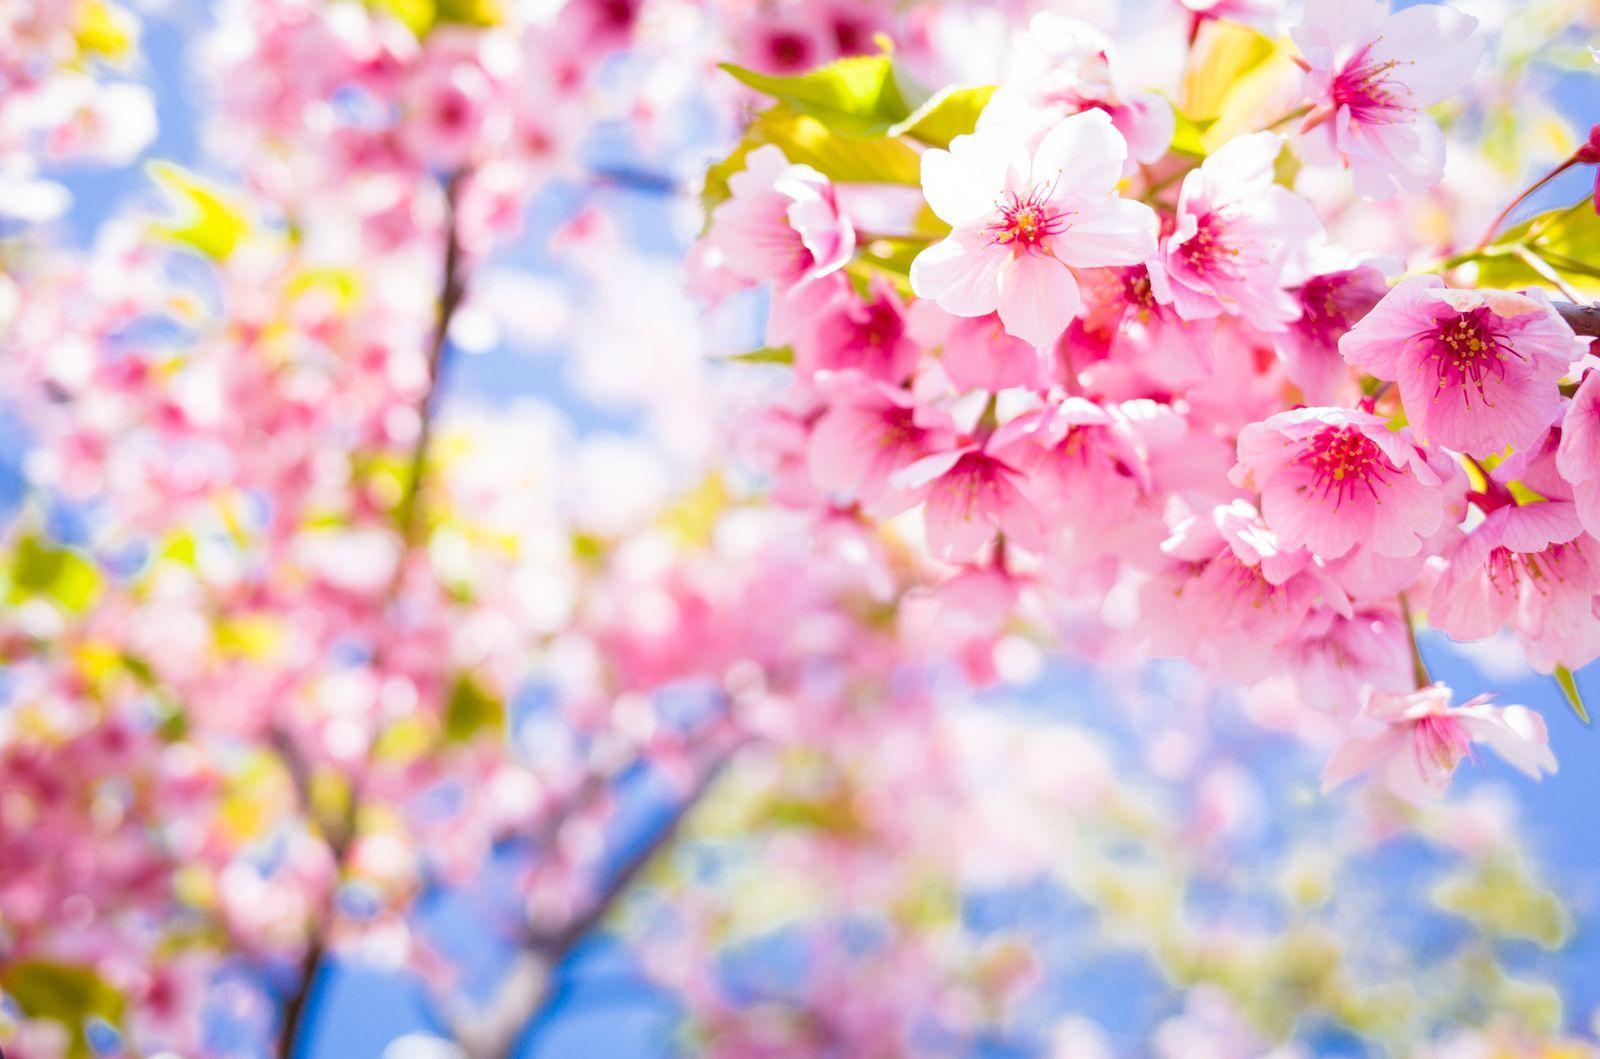 Cherry Blossom Tree Facts That You Definitely Never Knew Before In 2020 Blossom Trees Cherry Blossom Tree Blossom